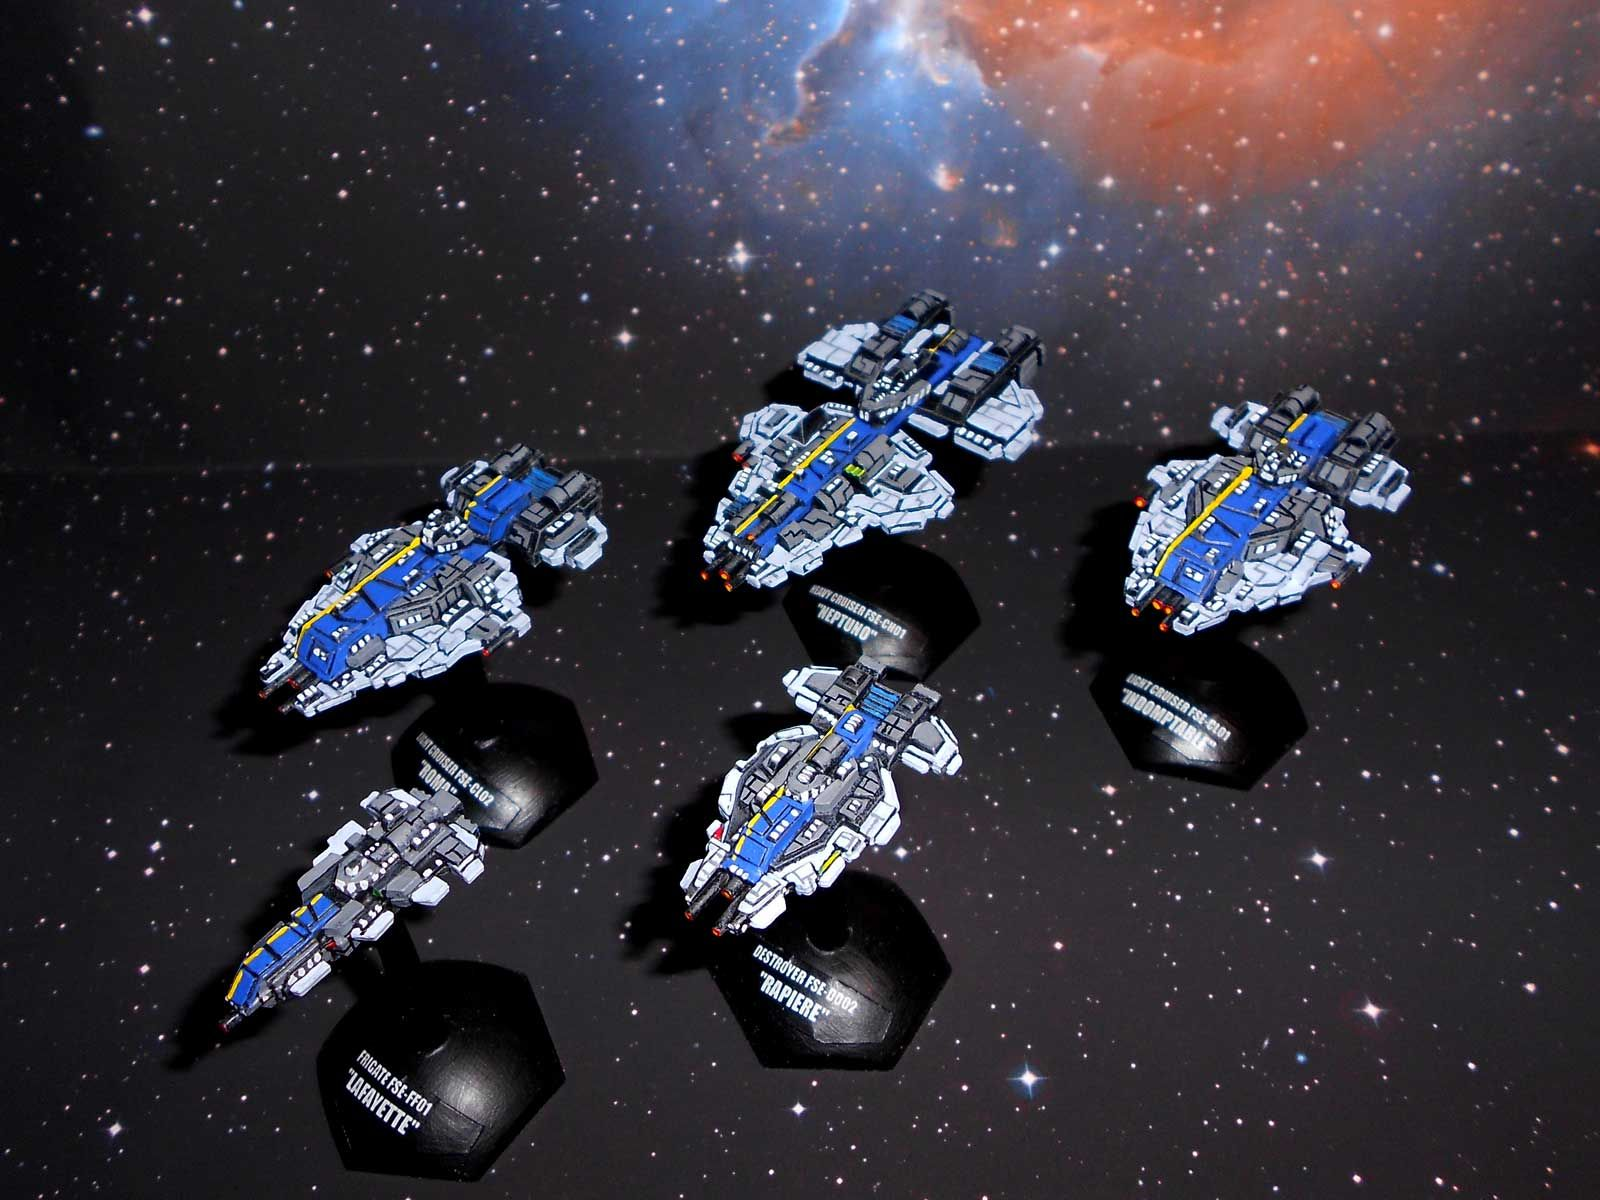 GGZ Full Thrust FSE spaceships Miniatures, Lego models